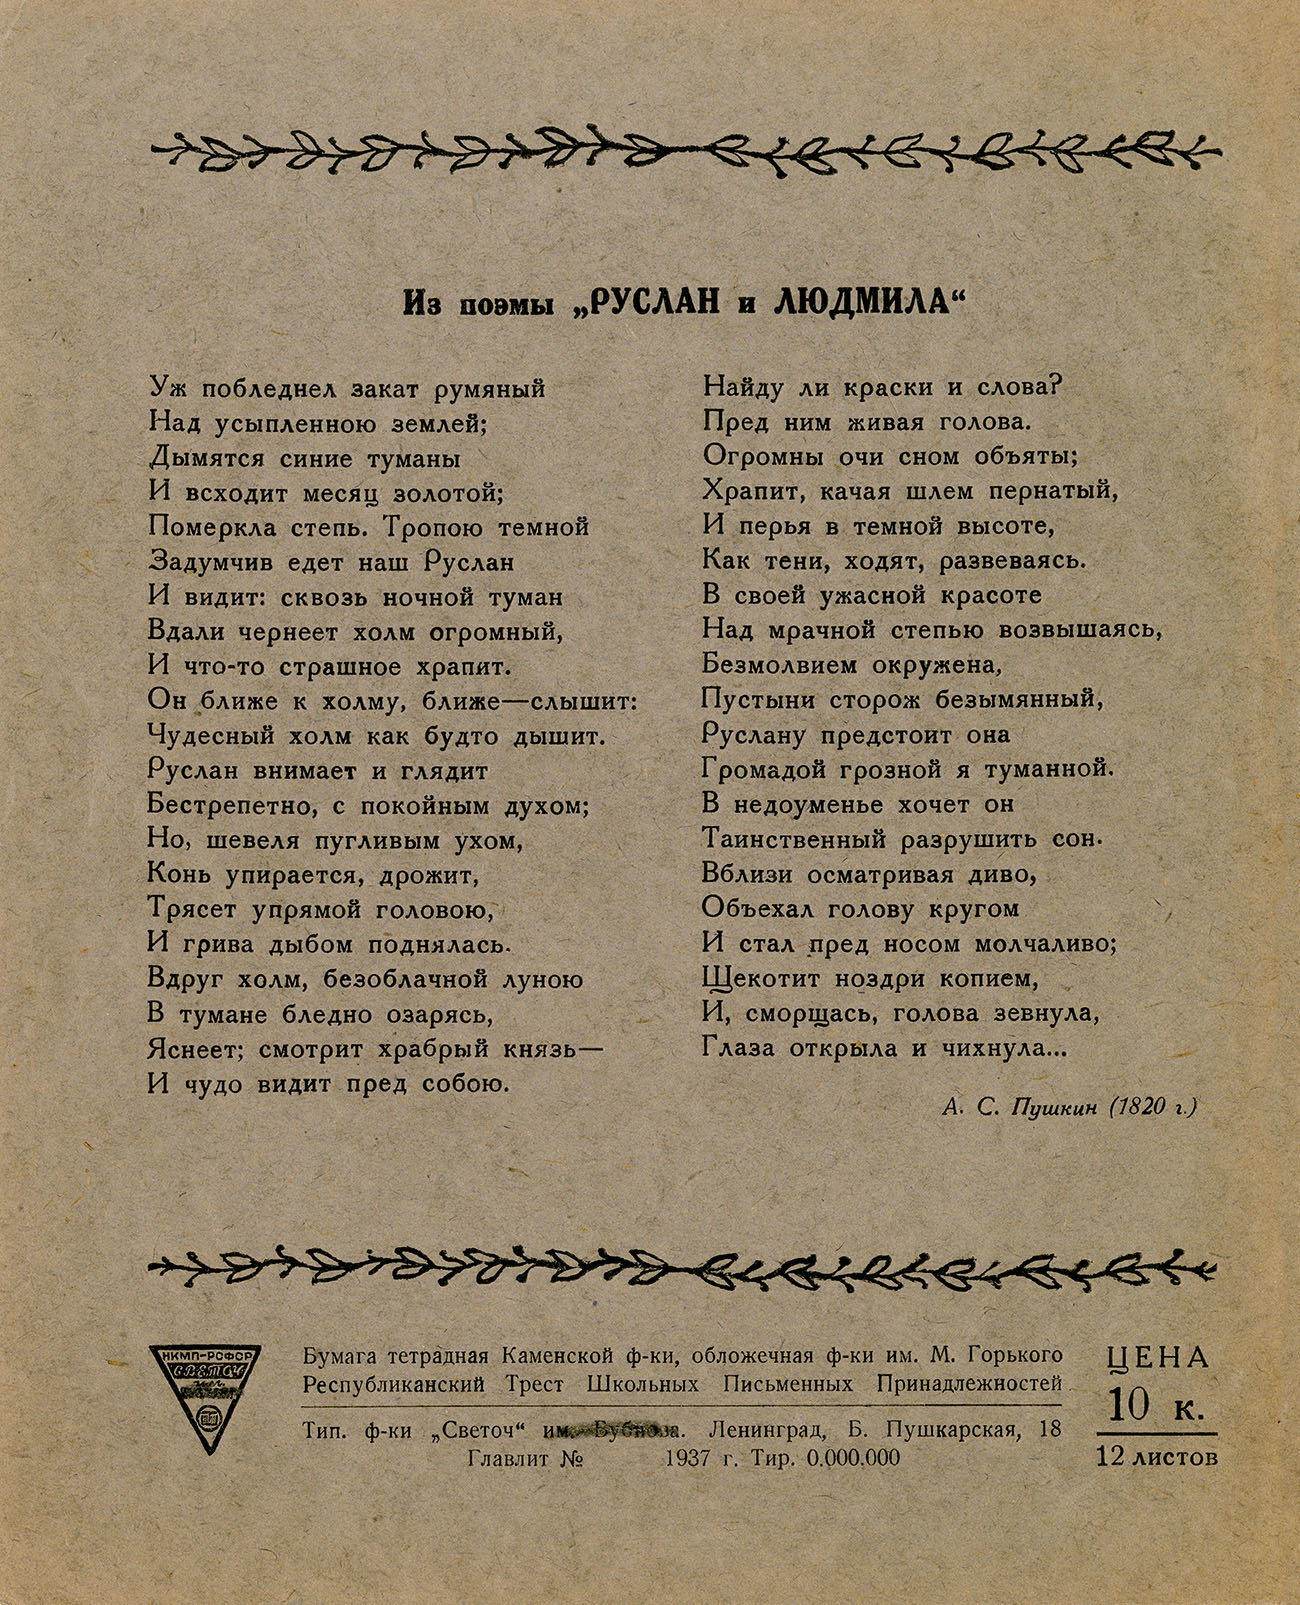 Пушкин. Руслан и Людмила. 1937. оборот